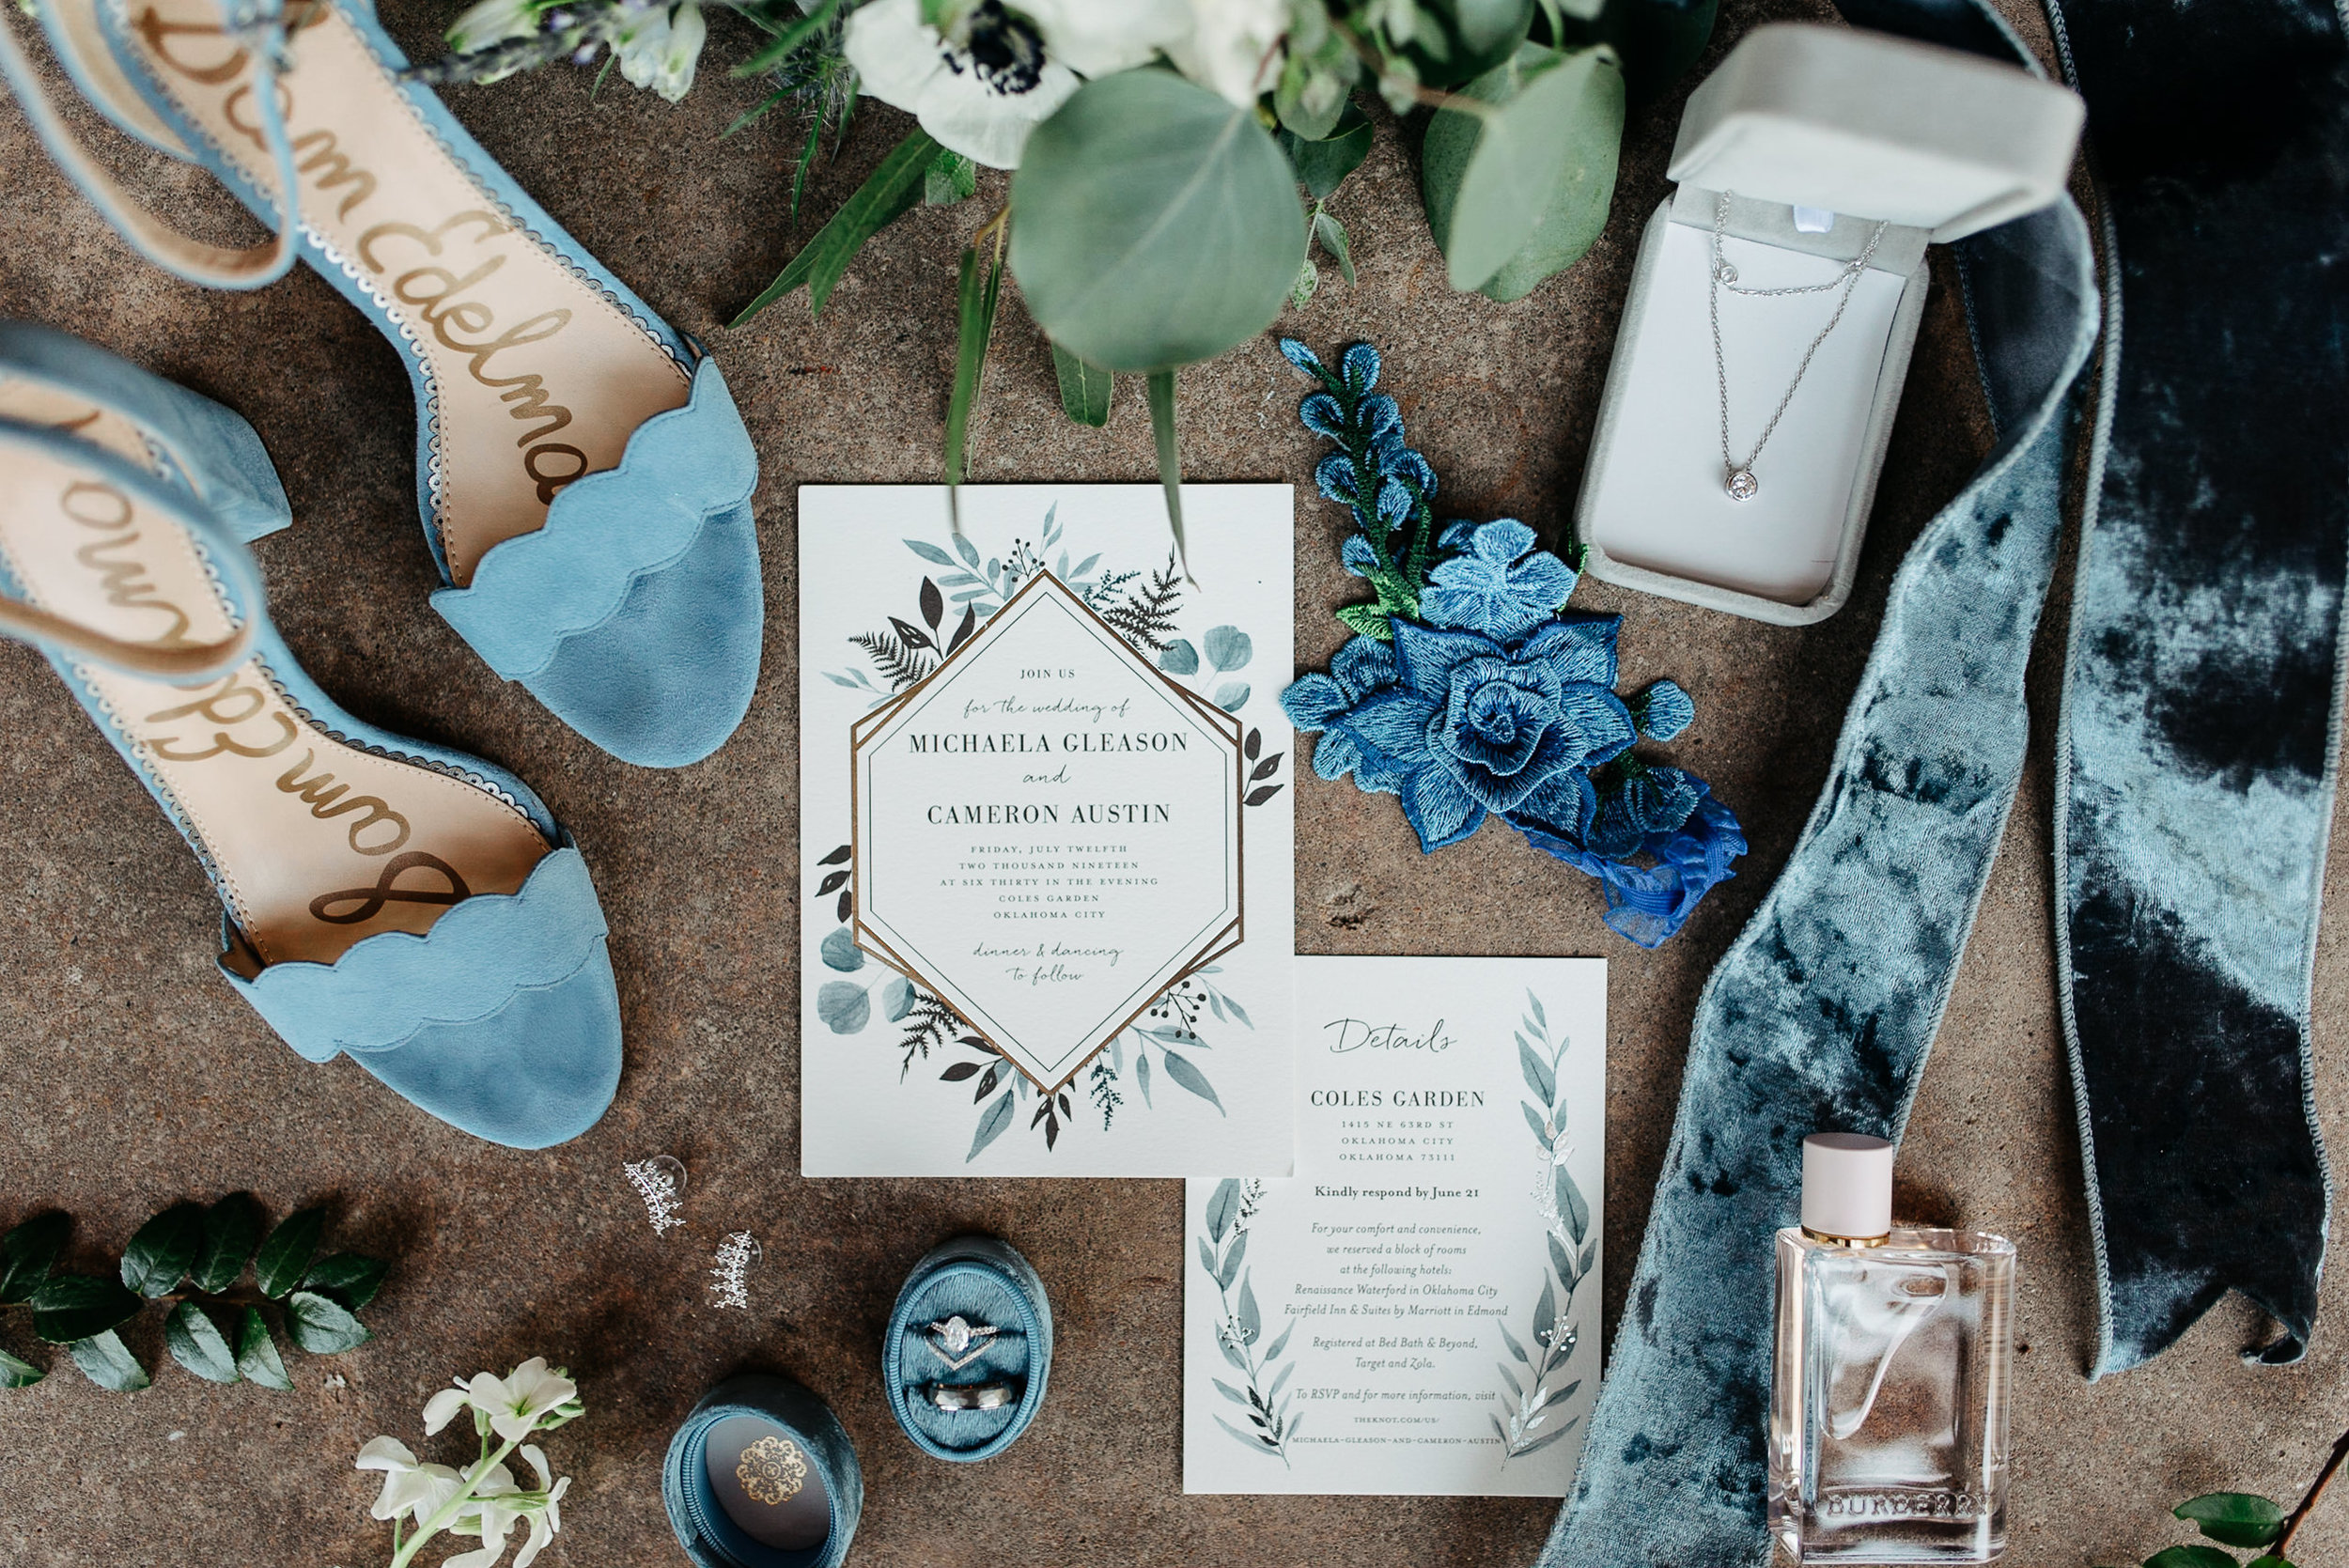 okc-wedding-photographer-coles-garden-wedding-okc-best-wedding-photographers-1.jpg